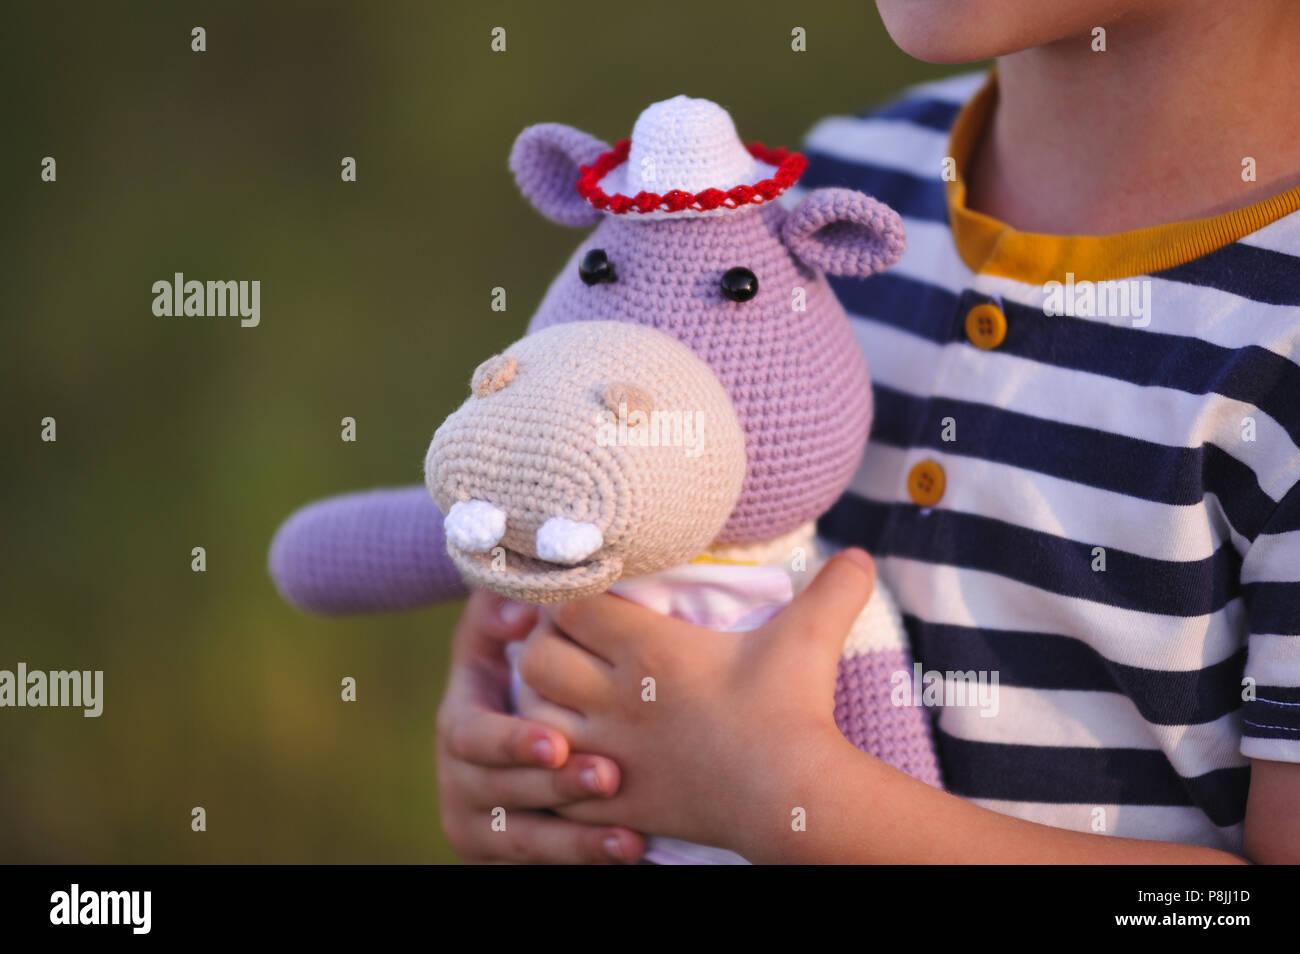 Hippo - PATTERN - Hippo - crochet - Amigurumi Hippo pattern ... | 955x1300